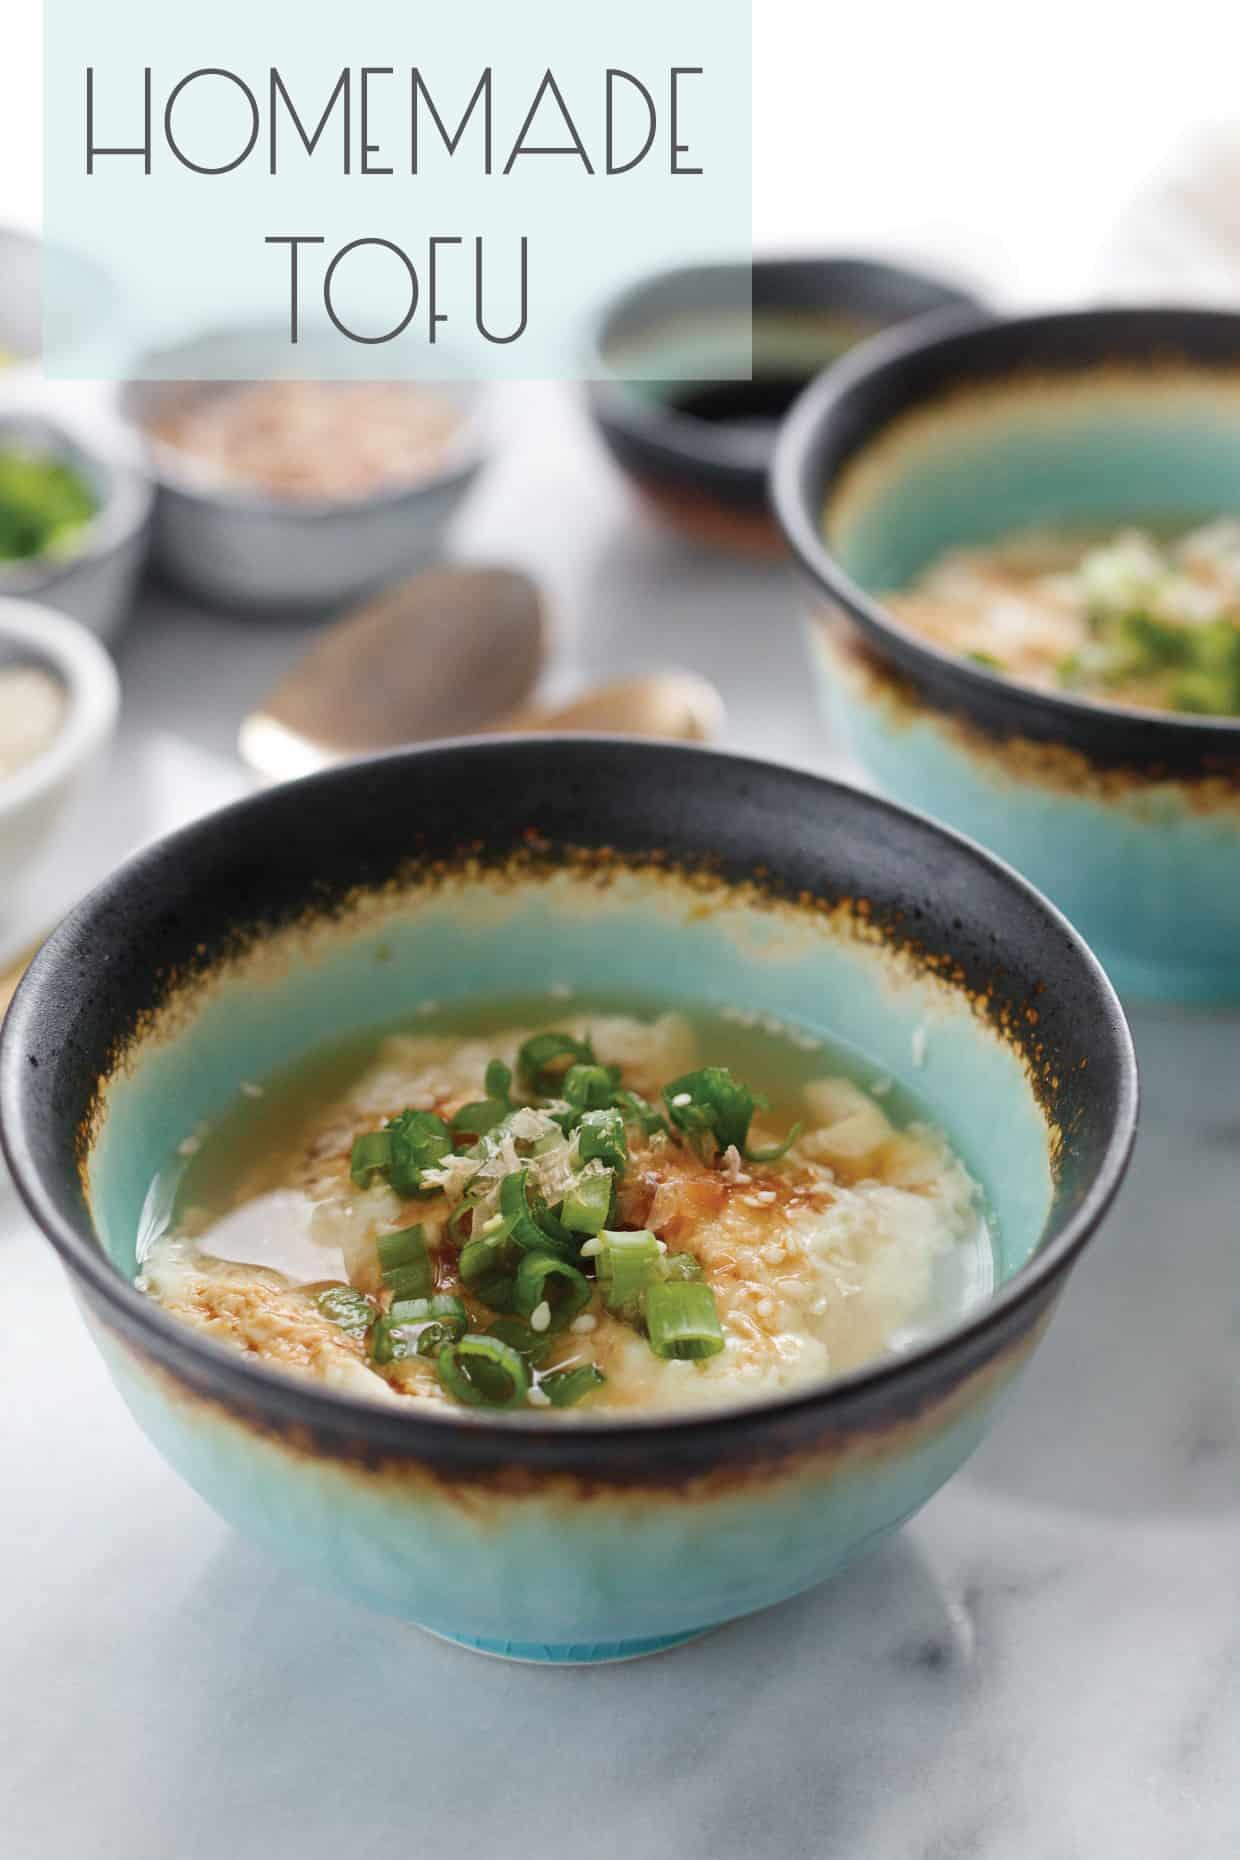 Oboro Tofu: Homemade Silken Tofu Curds